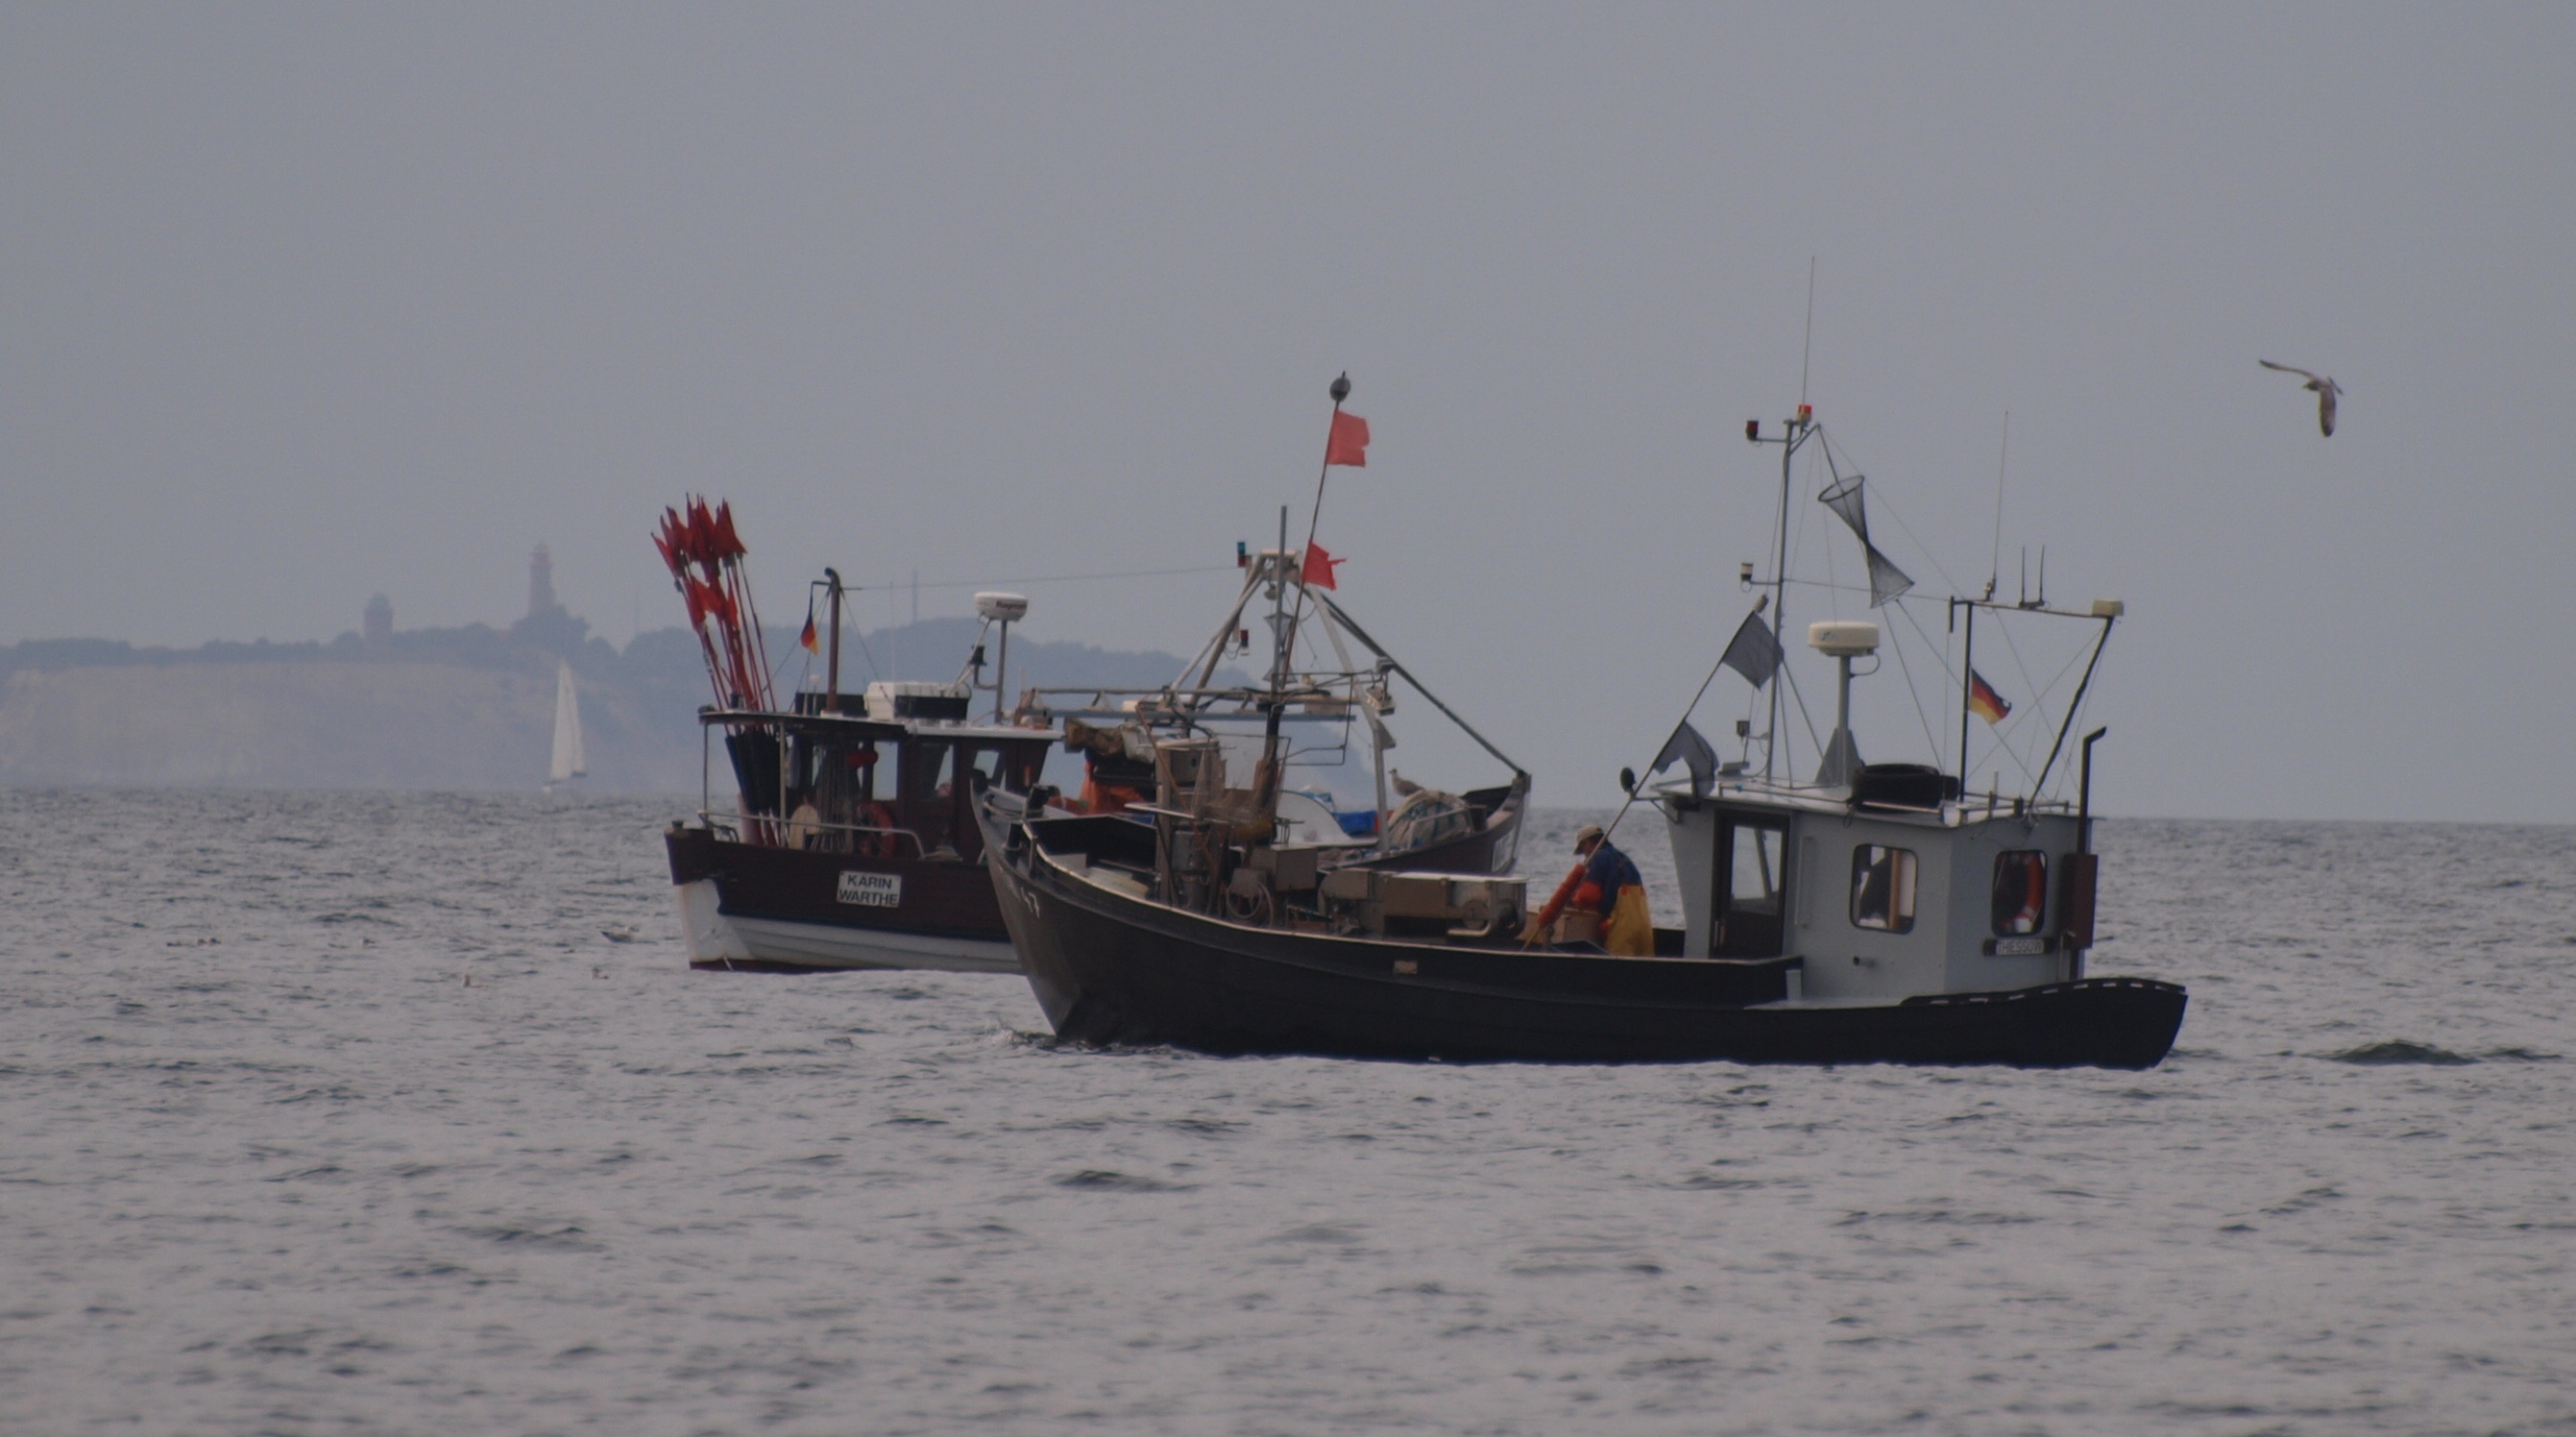 Lohme: Fischerboote in der Tromper Wiek - Herbst 2012